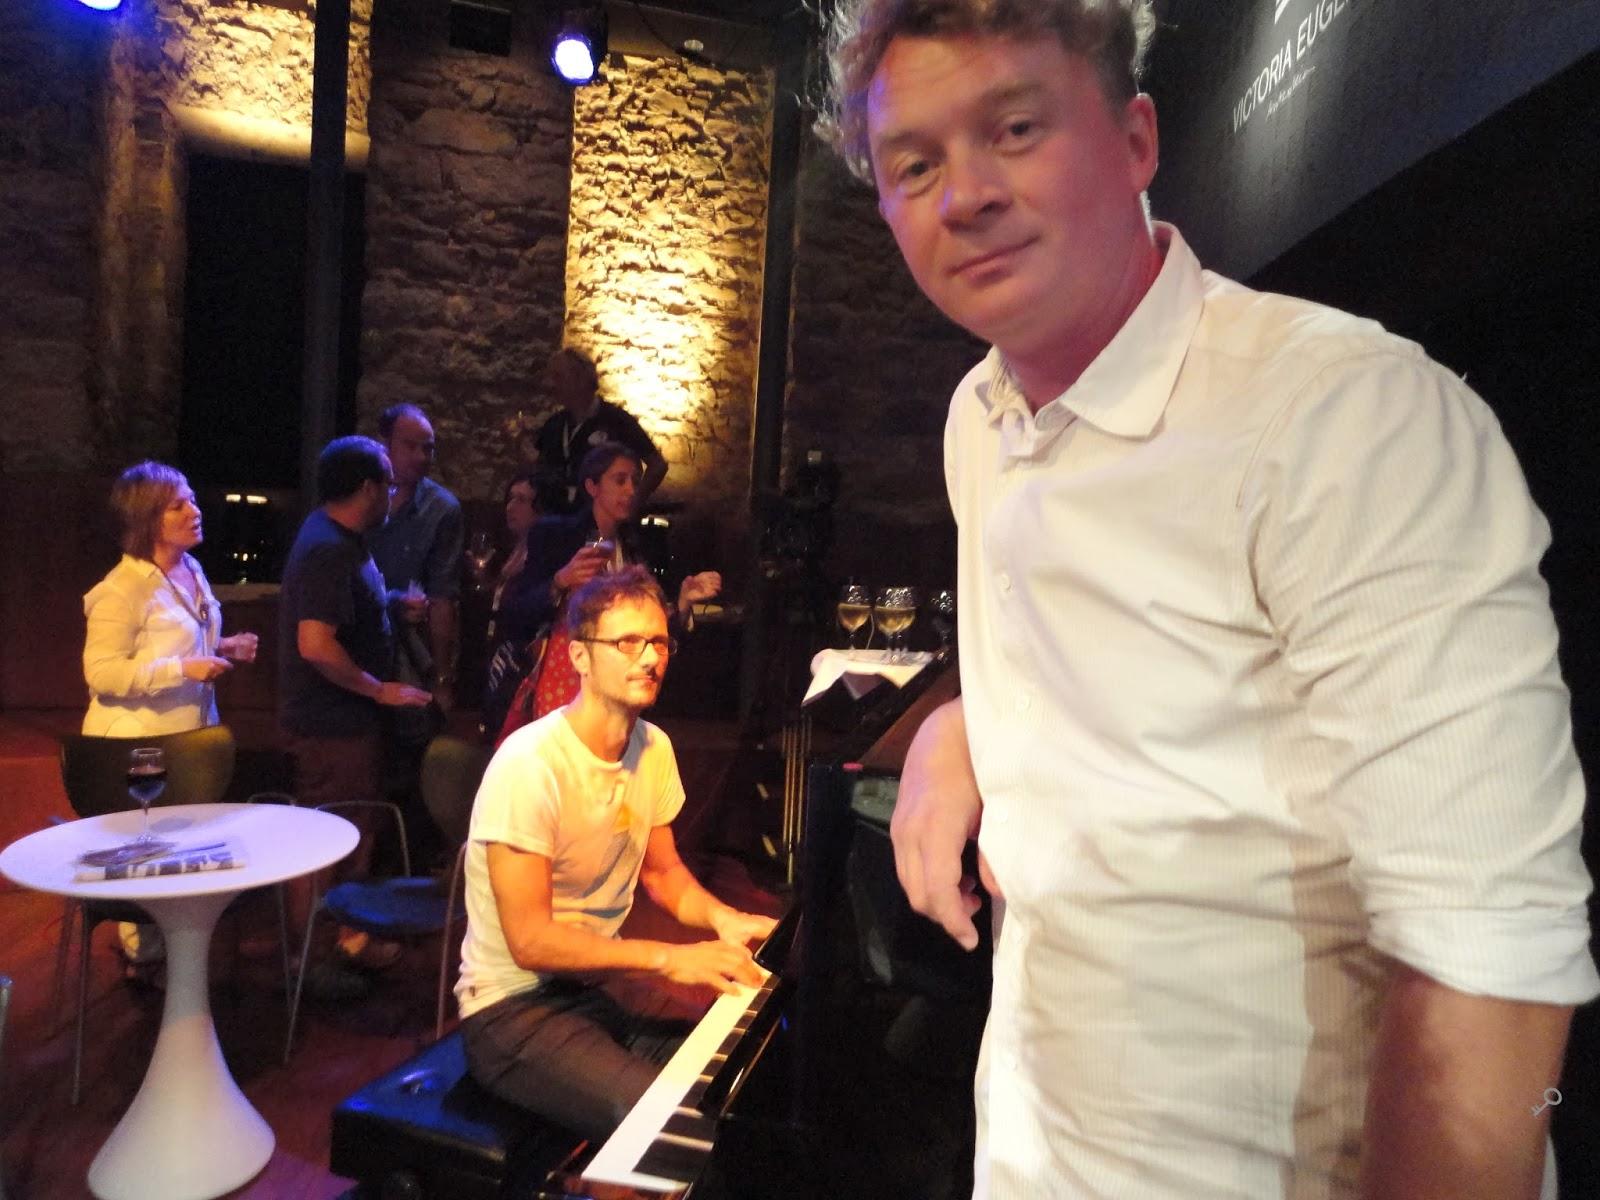 Encuentros Zabaltegui - Pianista (os diría el nombre pero no tengo ni idea) e Ignas Jonynas, director de The Gambler